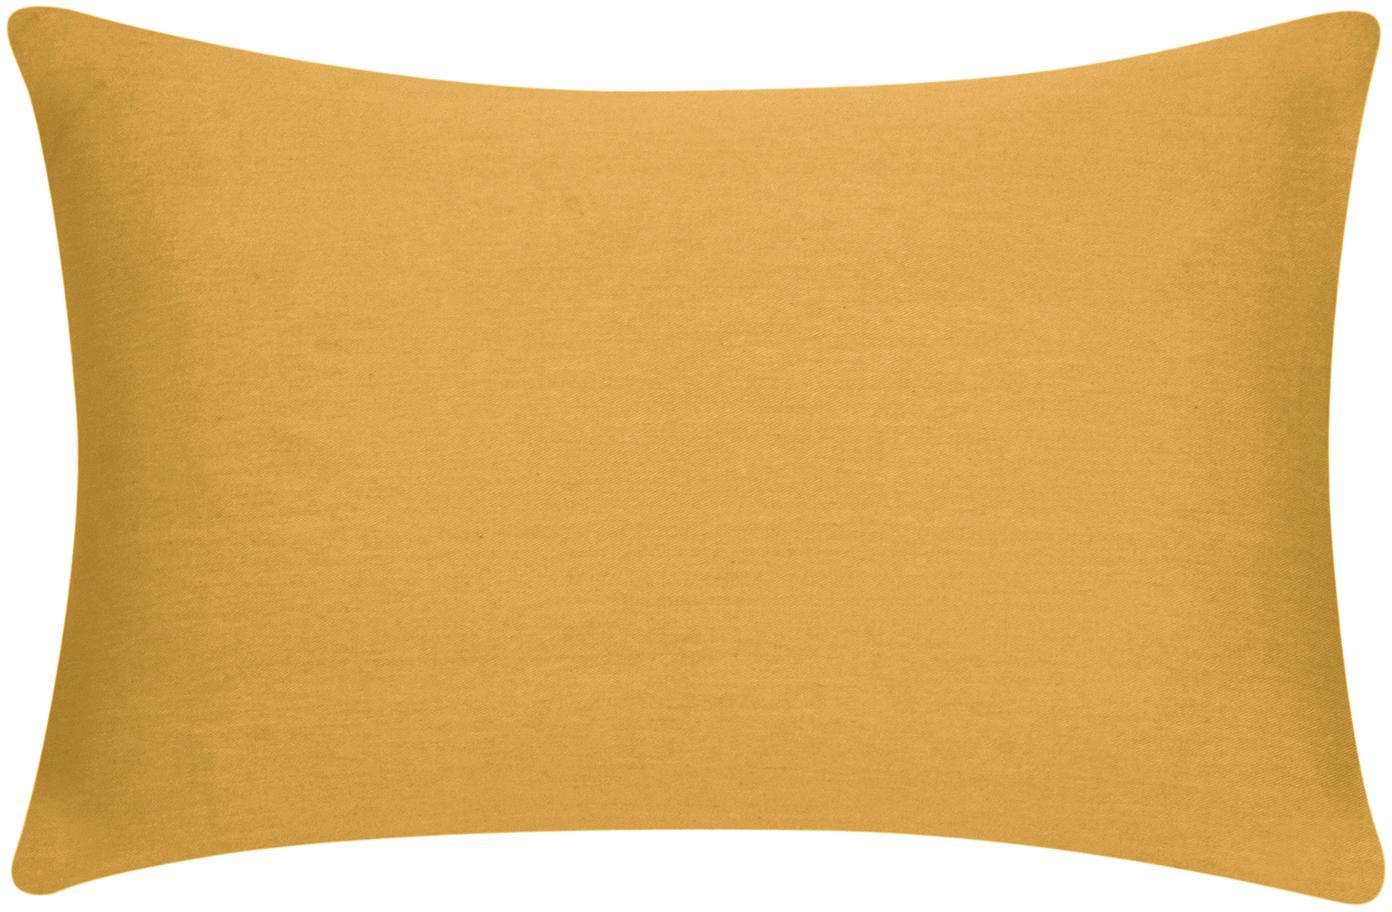 Baumwoll-Kissenhülle Mads in Senfgelb, 100% Baumwolle, Senfgelb, 30 x 50 cm